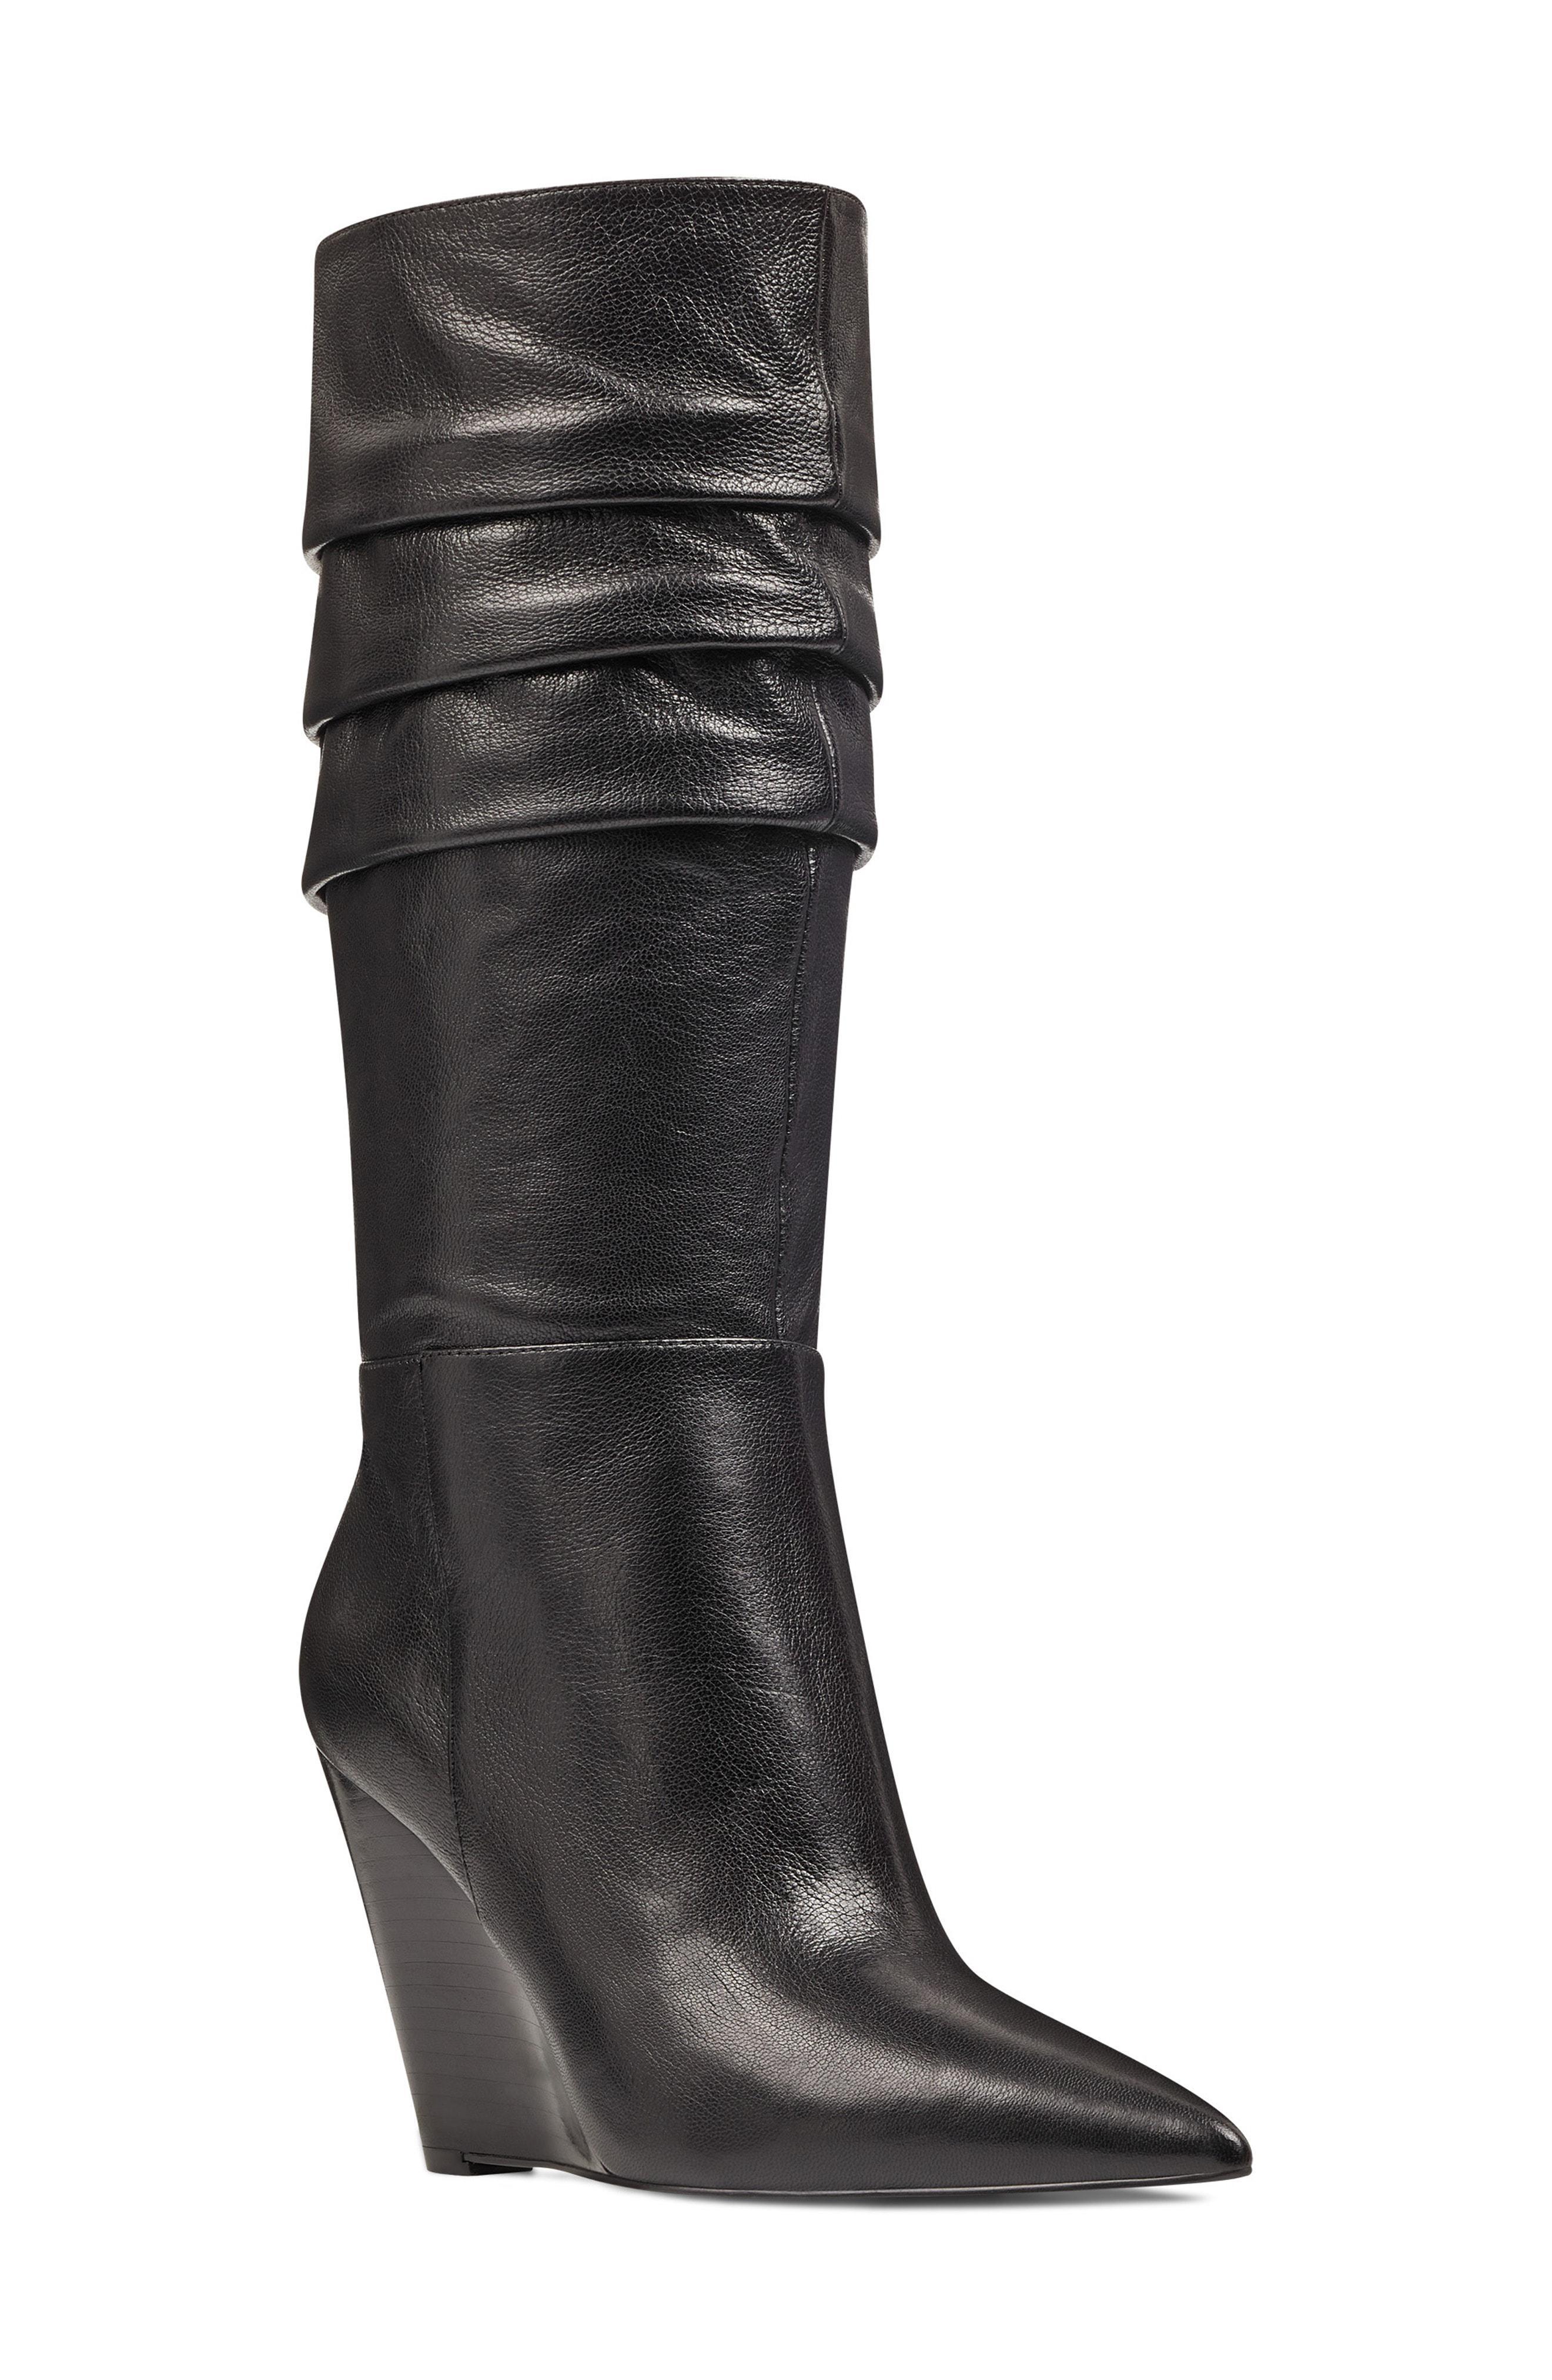 2b5d06ec6dd Nine West. Women s Vernese Tiered Knee High Wedge Boot